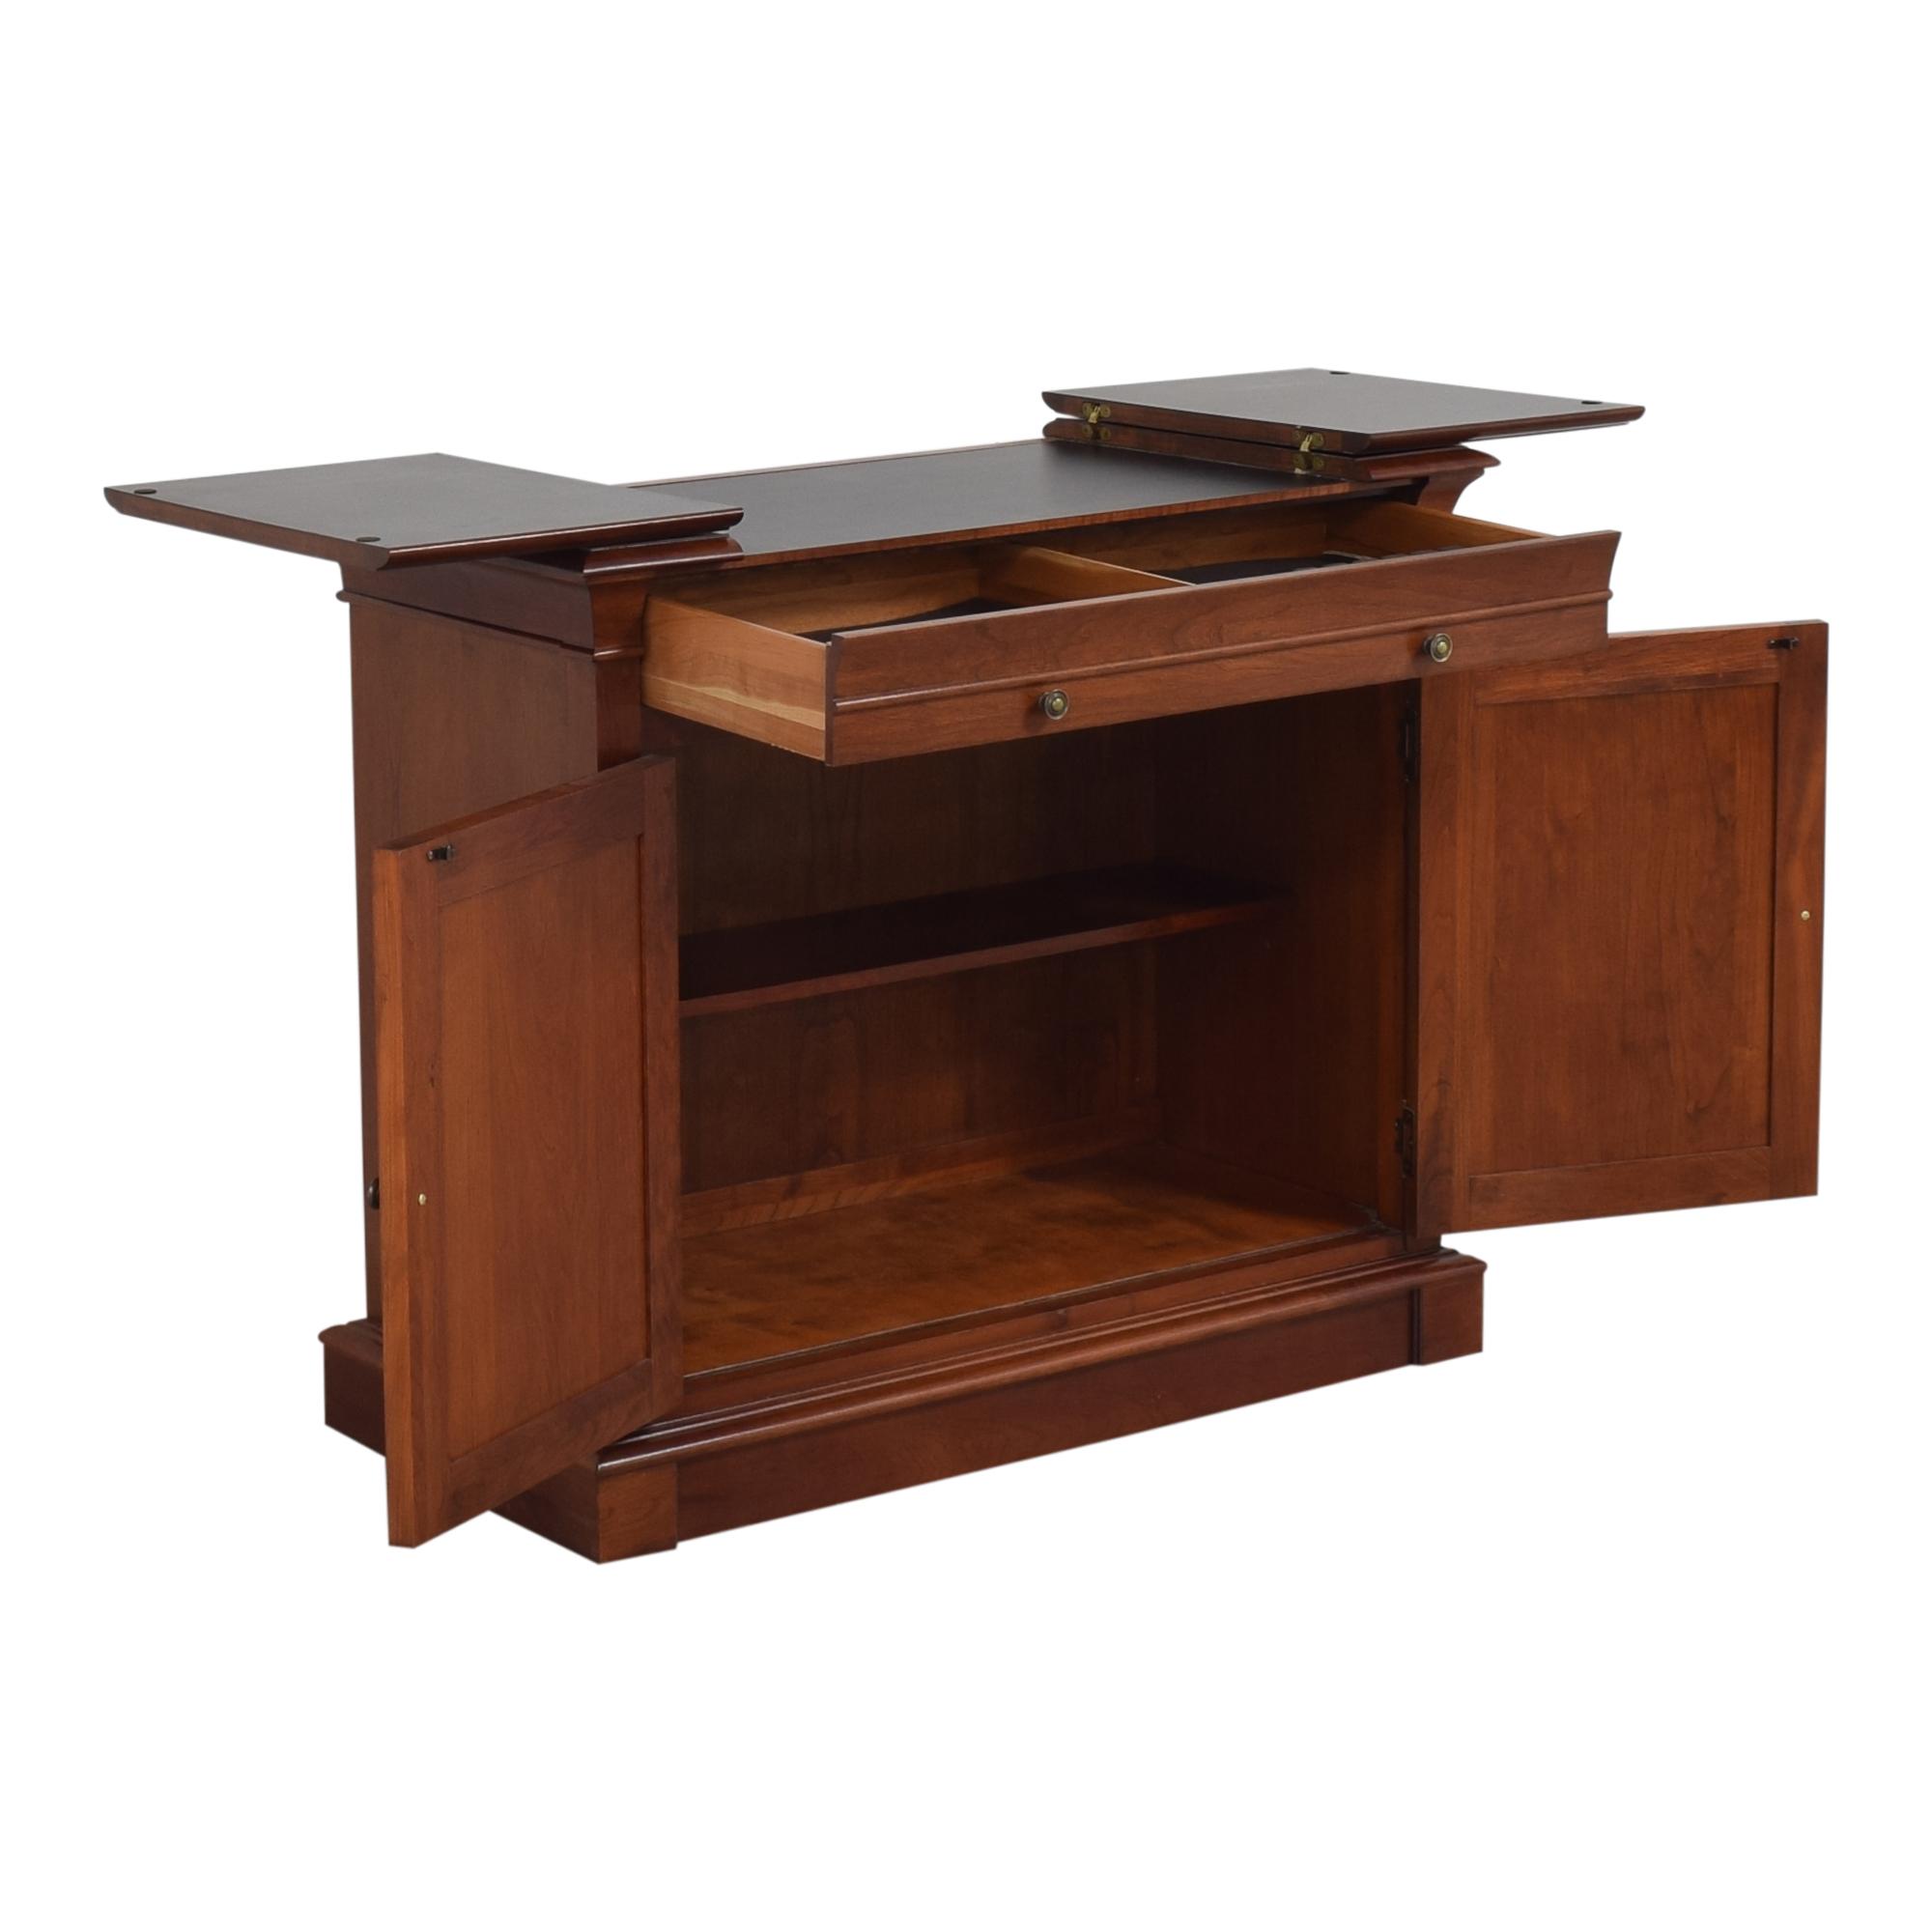 Ethan Allen Ethan Allen Medallion Flip Top Buffet Cabinet Cabinets & Sideboards